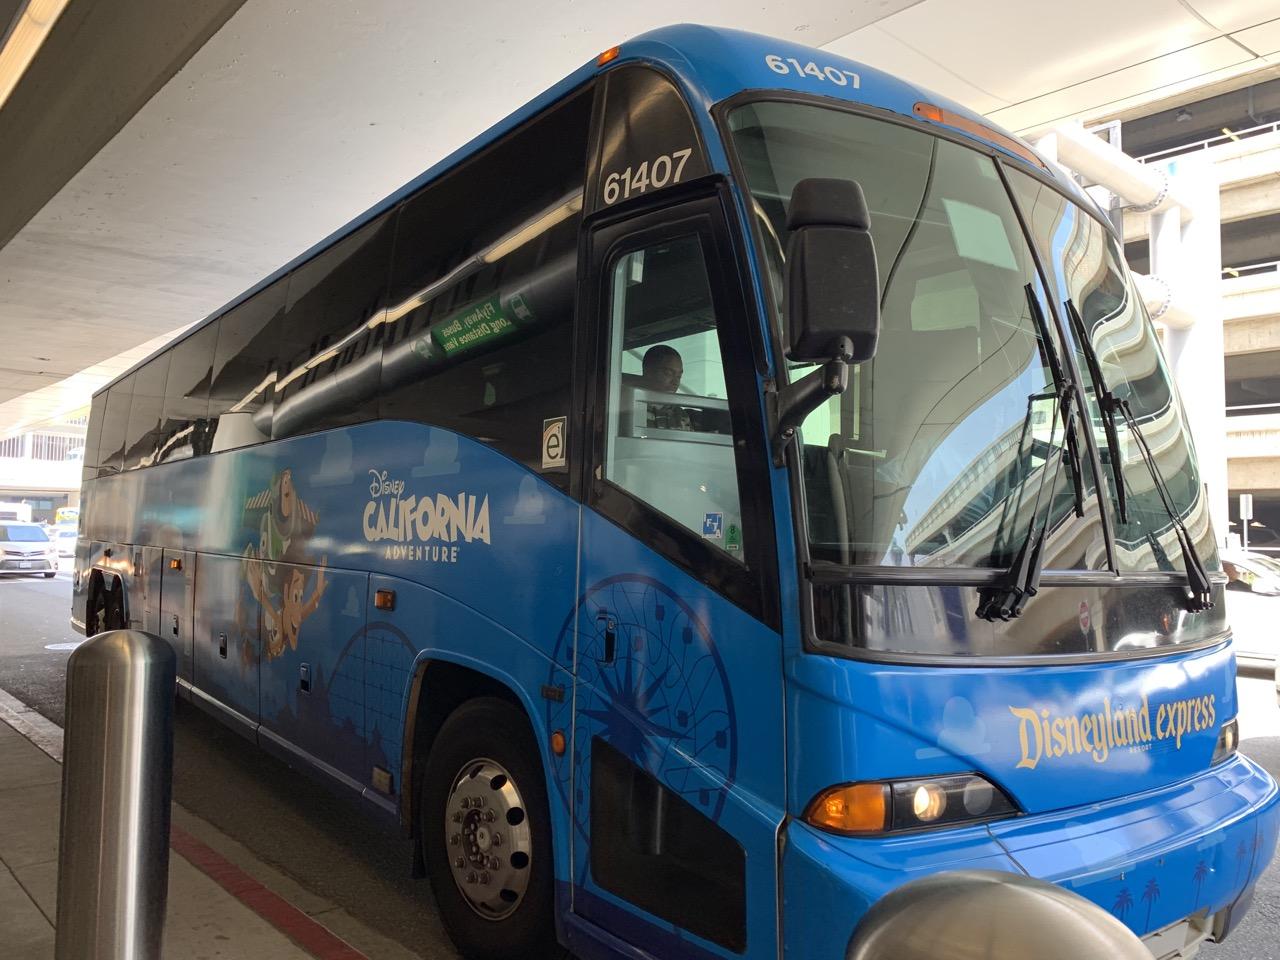 disneyland trip report june 2019 part 1 02 disneyland express.jpeg